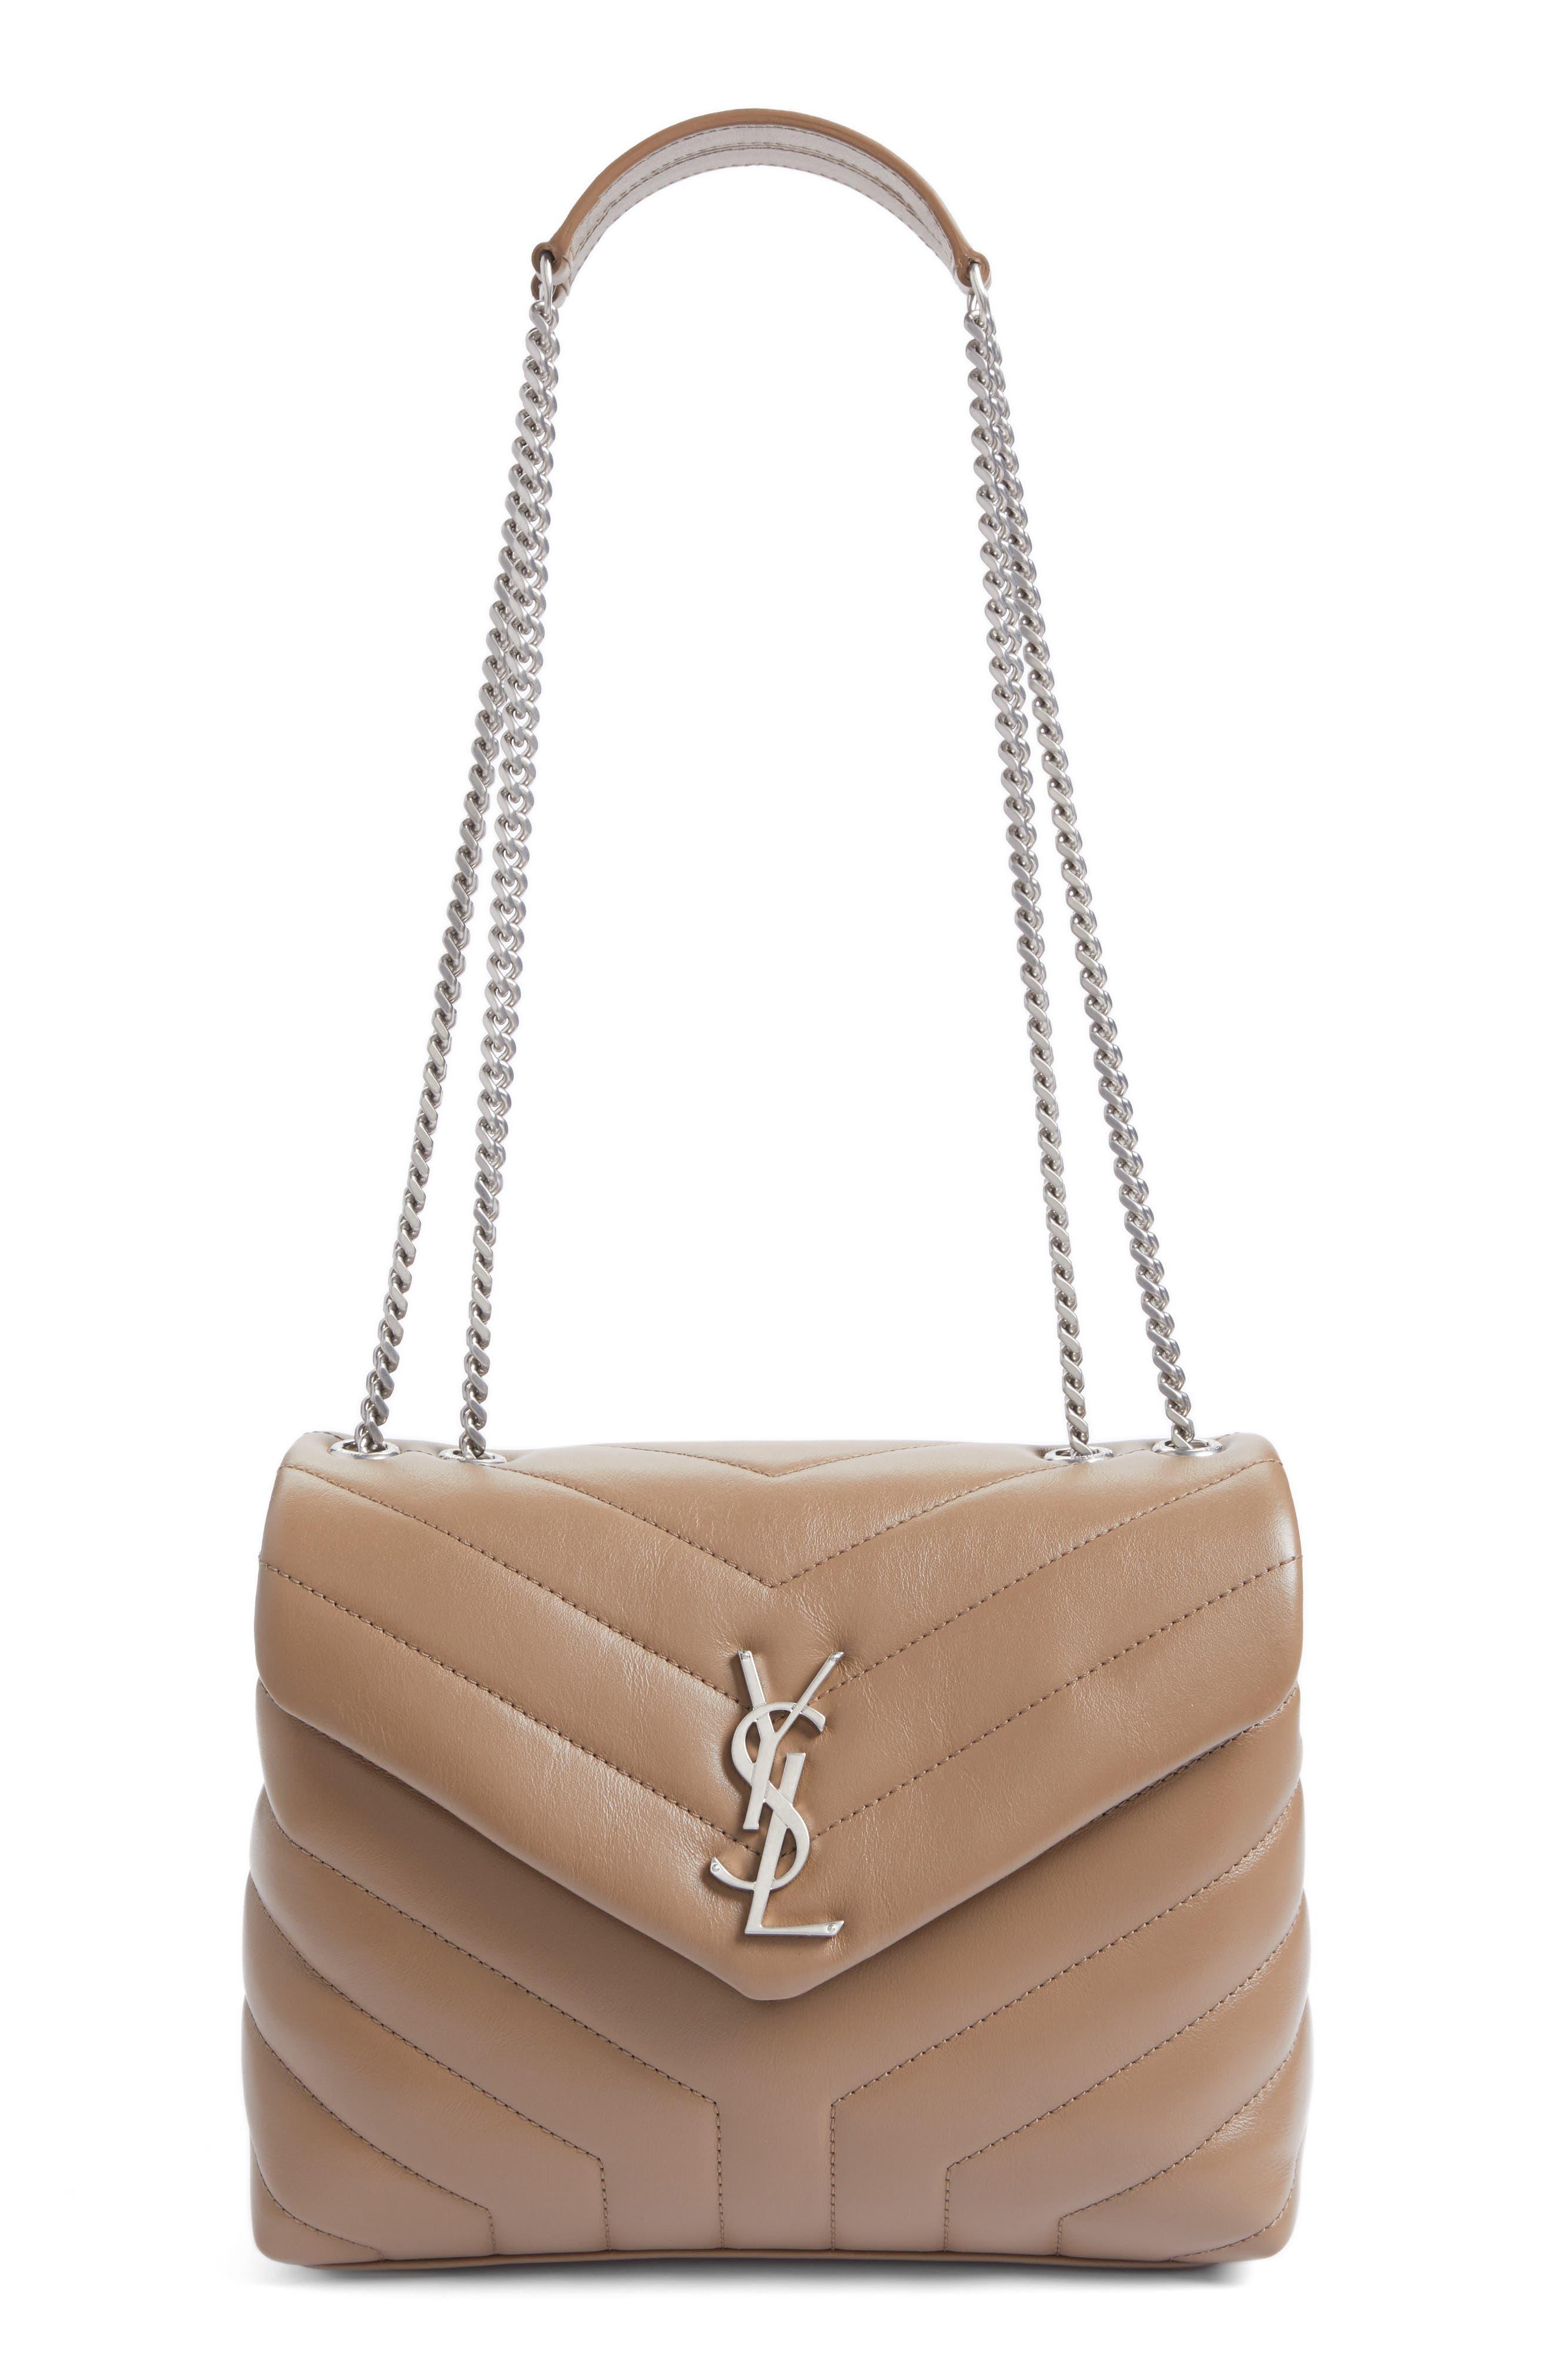 Alternate Image 1 Selected - Saint Laurent Small Loulou Matelassé Leather Shoulder Bag